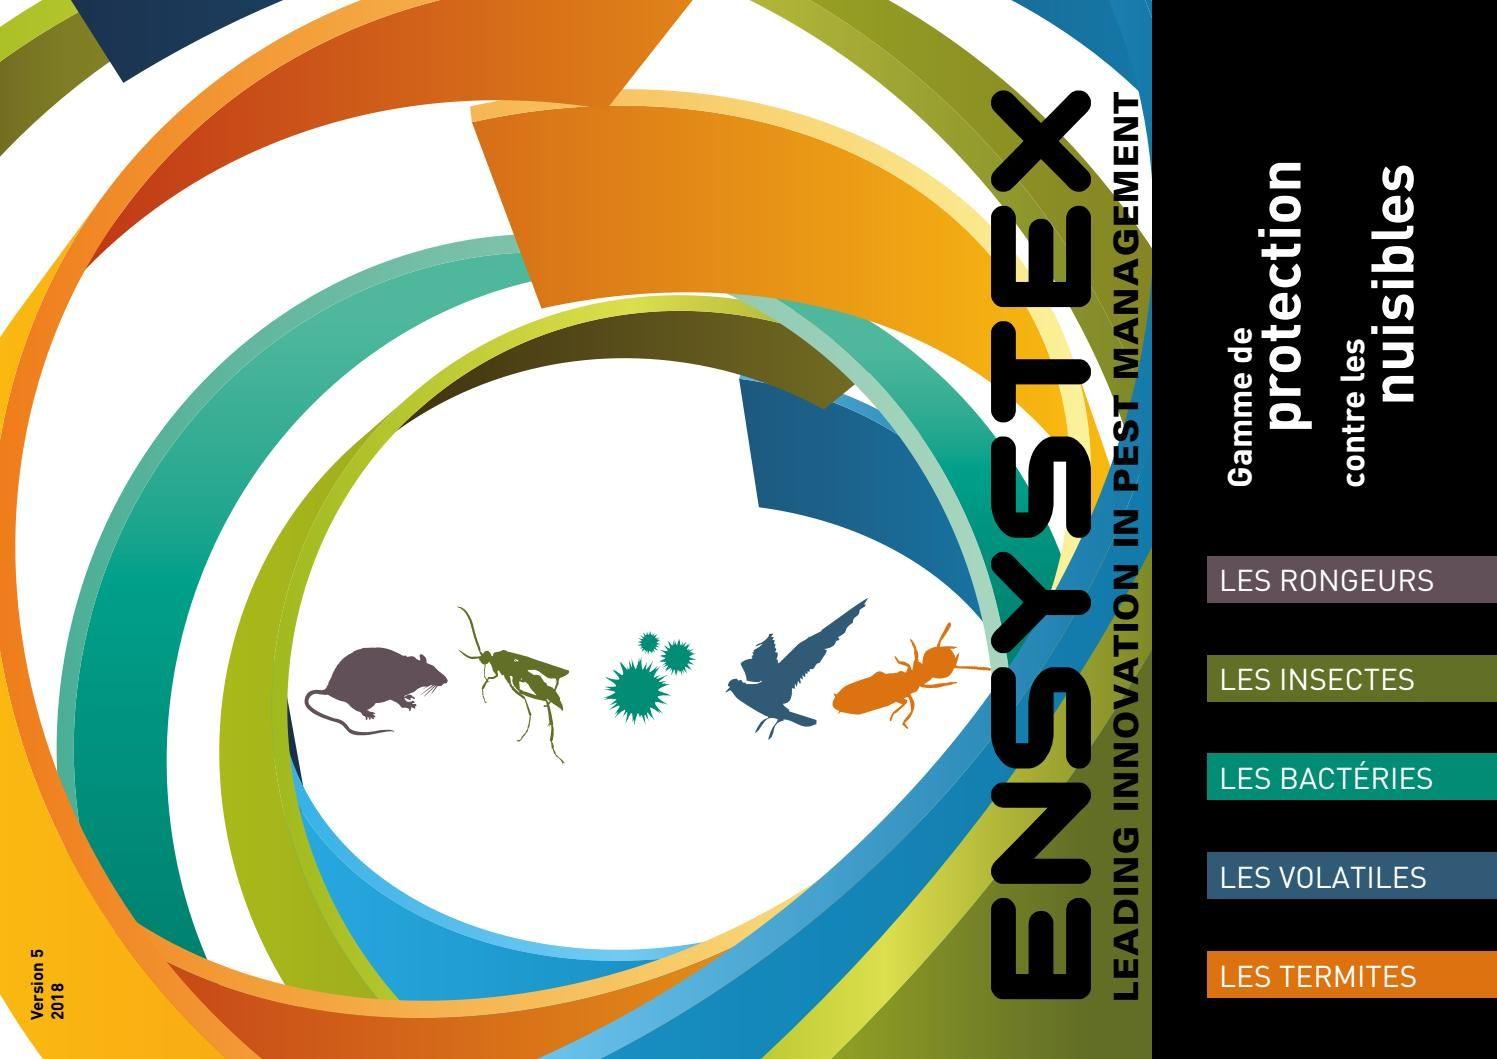 Desinfection Punaise De Lit Prix Douce Catalogue Ensystex Europe 2018 By Ensystex Europe Issuu